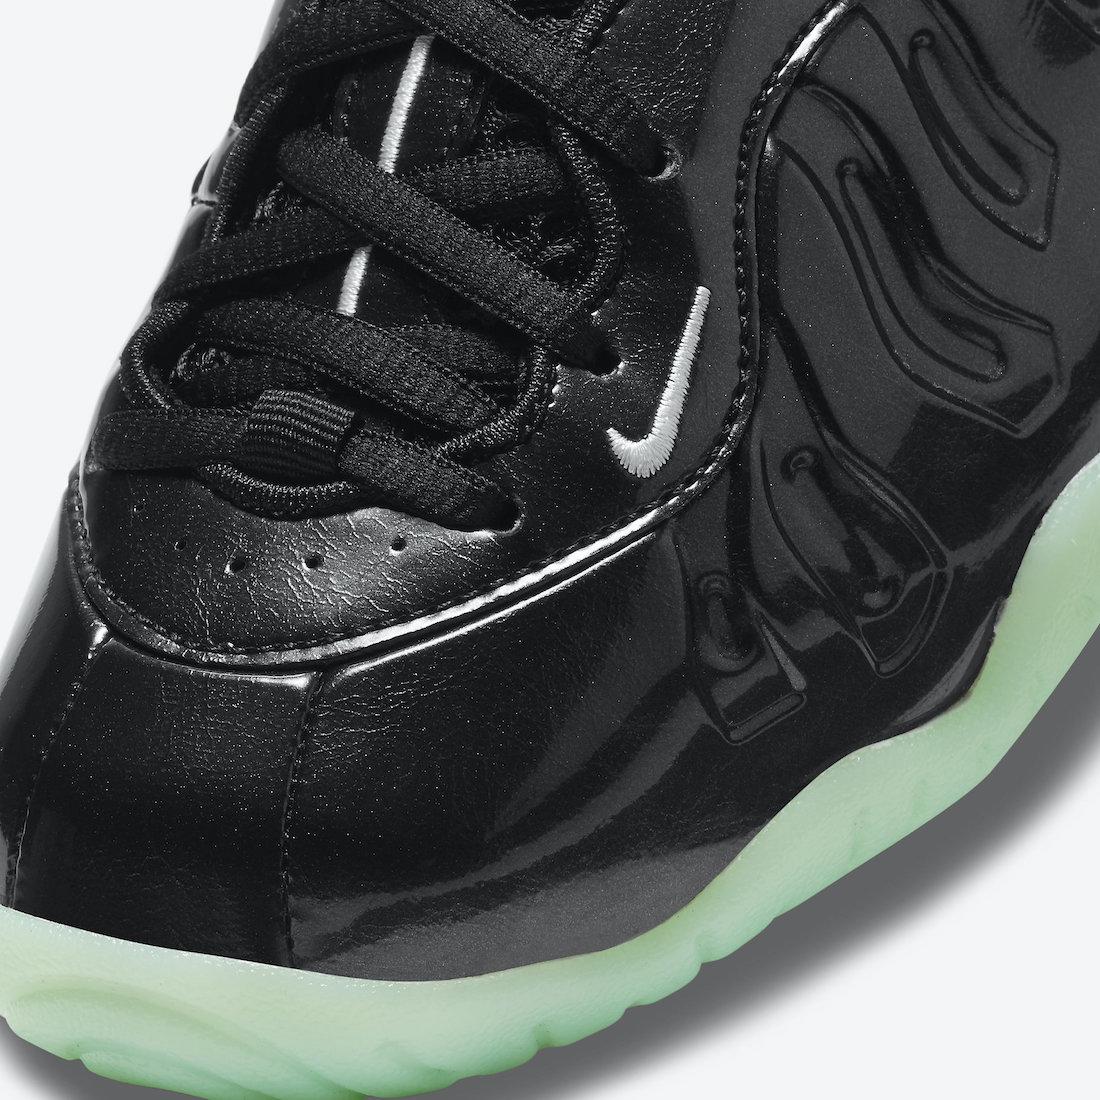 Nike Air Foamposite One All-Star 2021 CV1766-001 Release Date Info